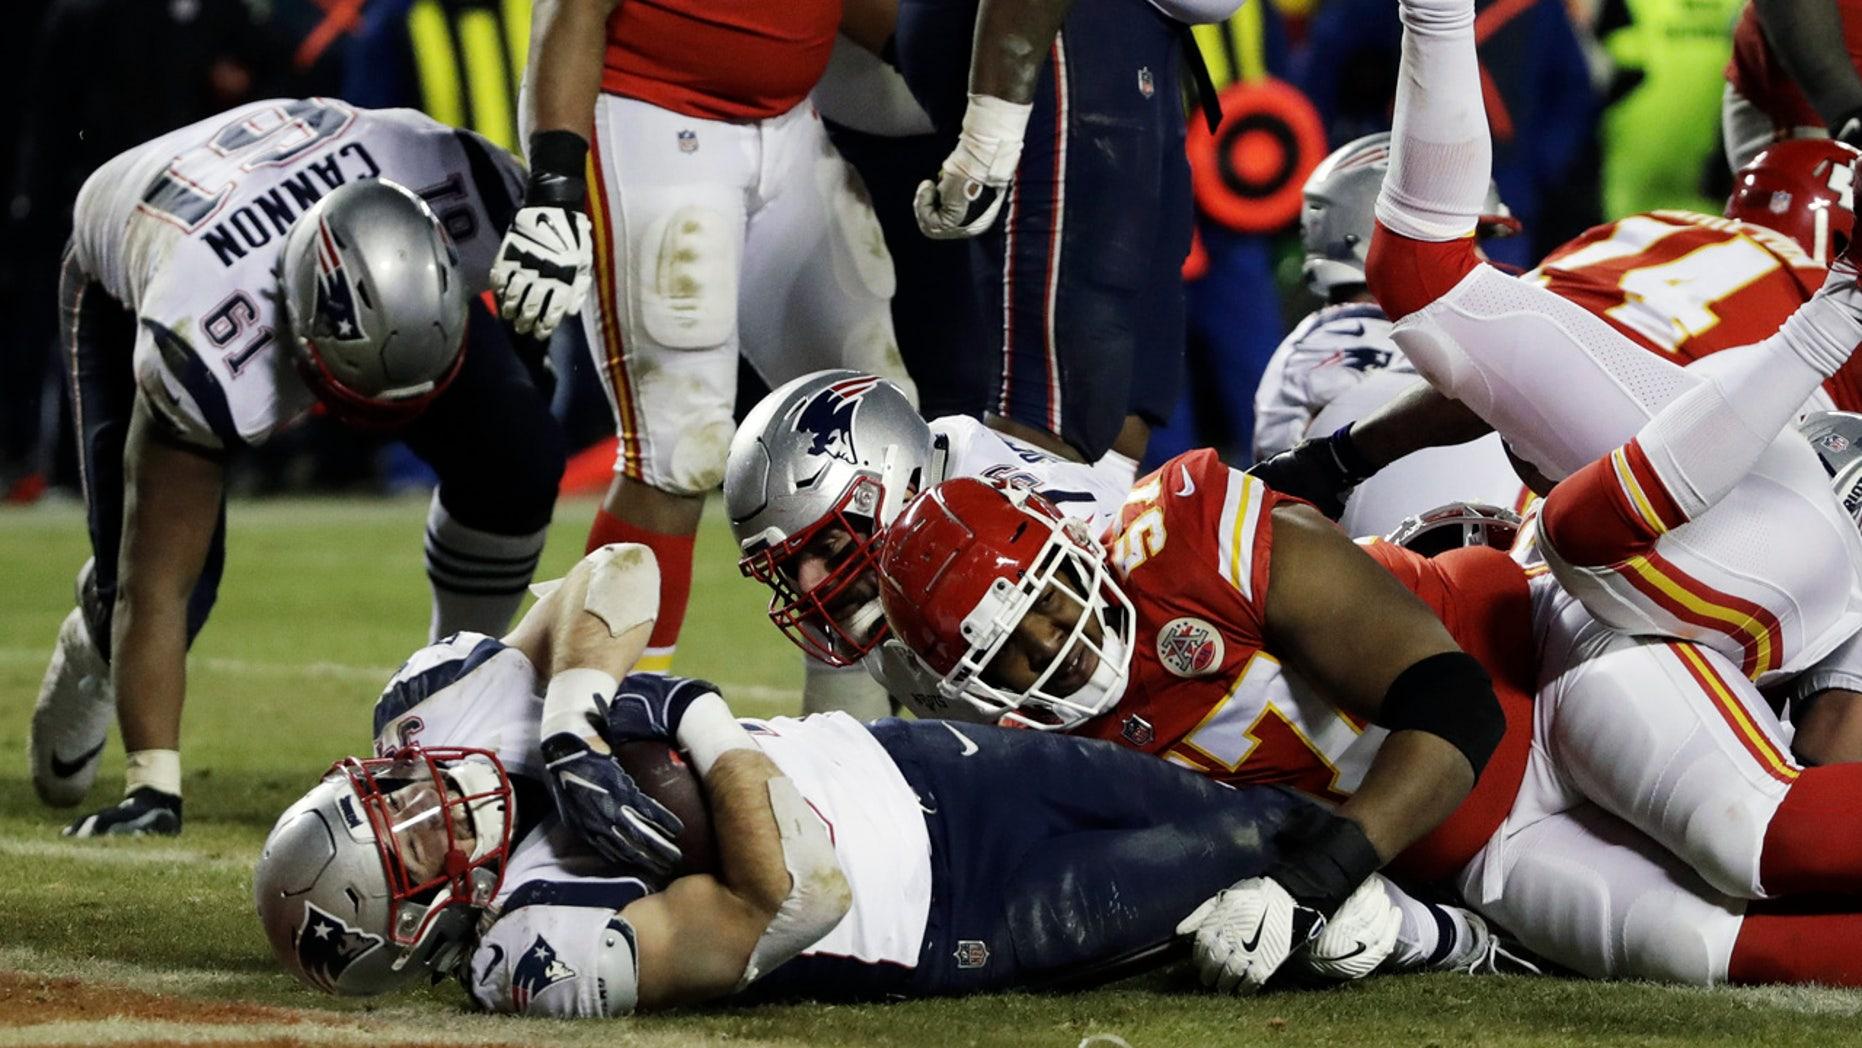 Rex Burkhead goes in for the winning score in overtime. (AP Photo/Elise Amendola)